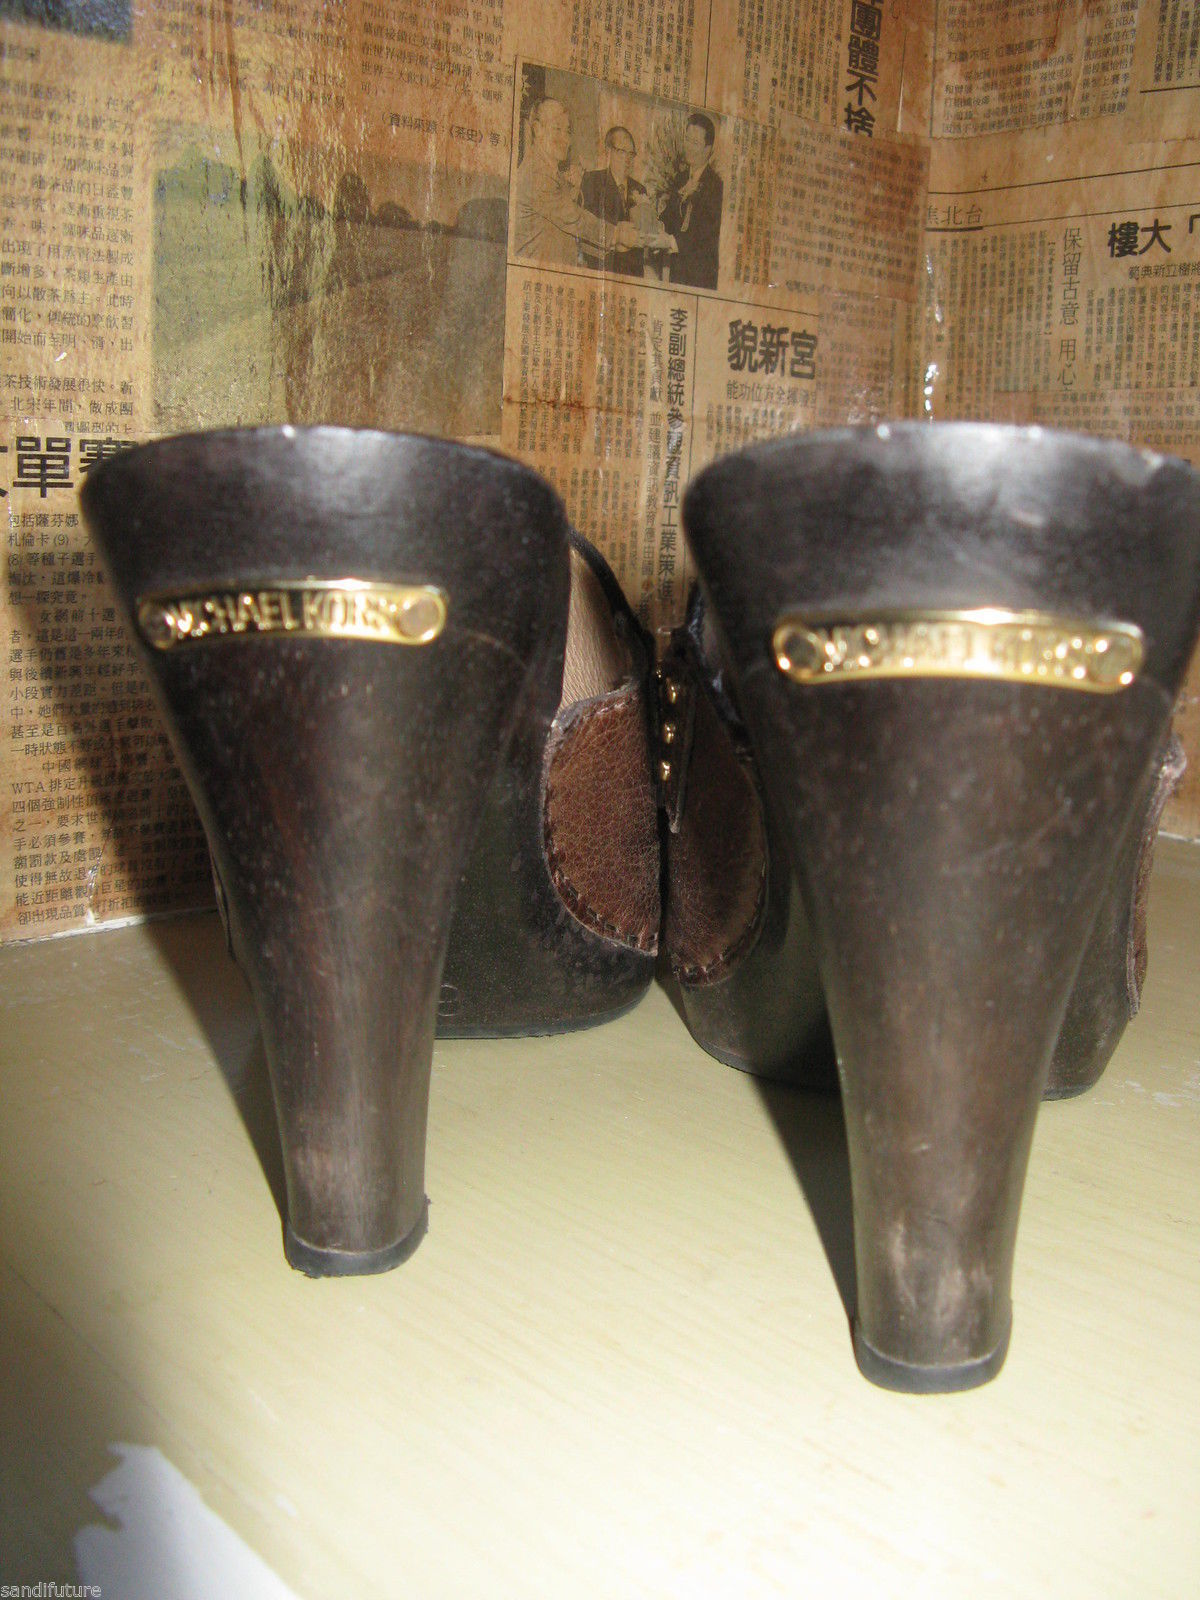 Michael Kors San Antonio platform clog mule wooden tassel shoes 6.5 UK4 36.5 image 3